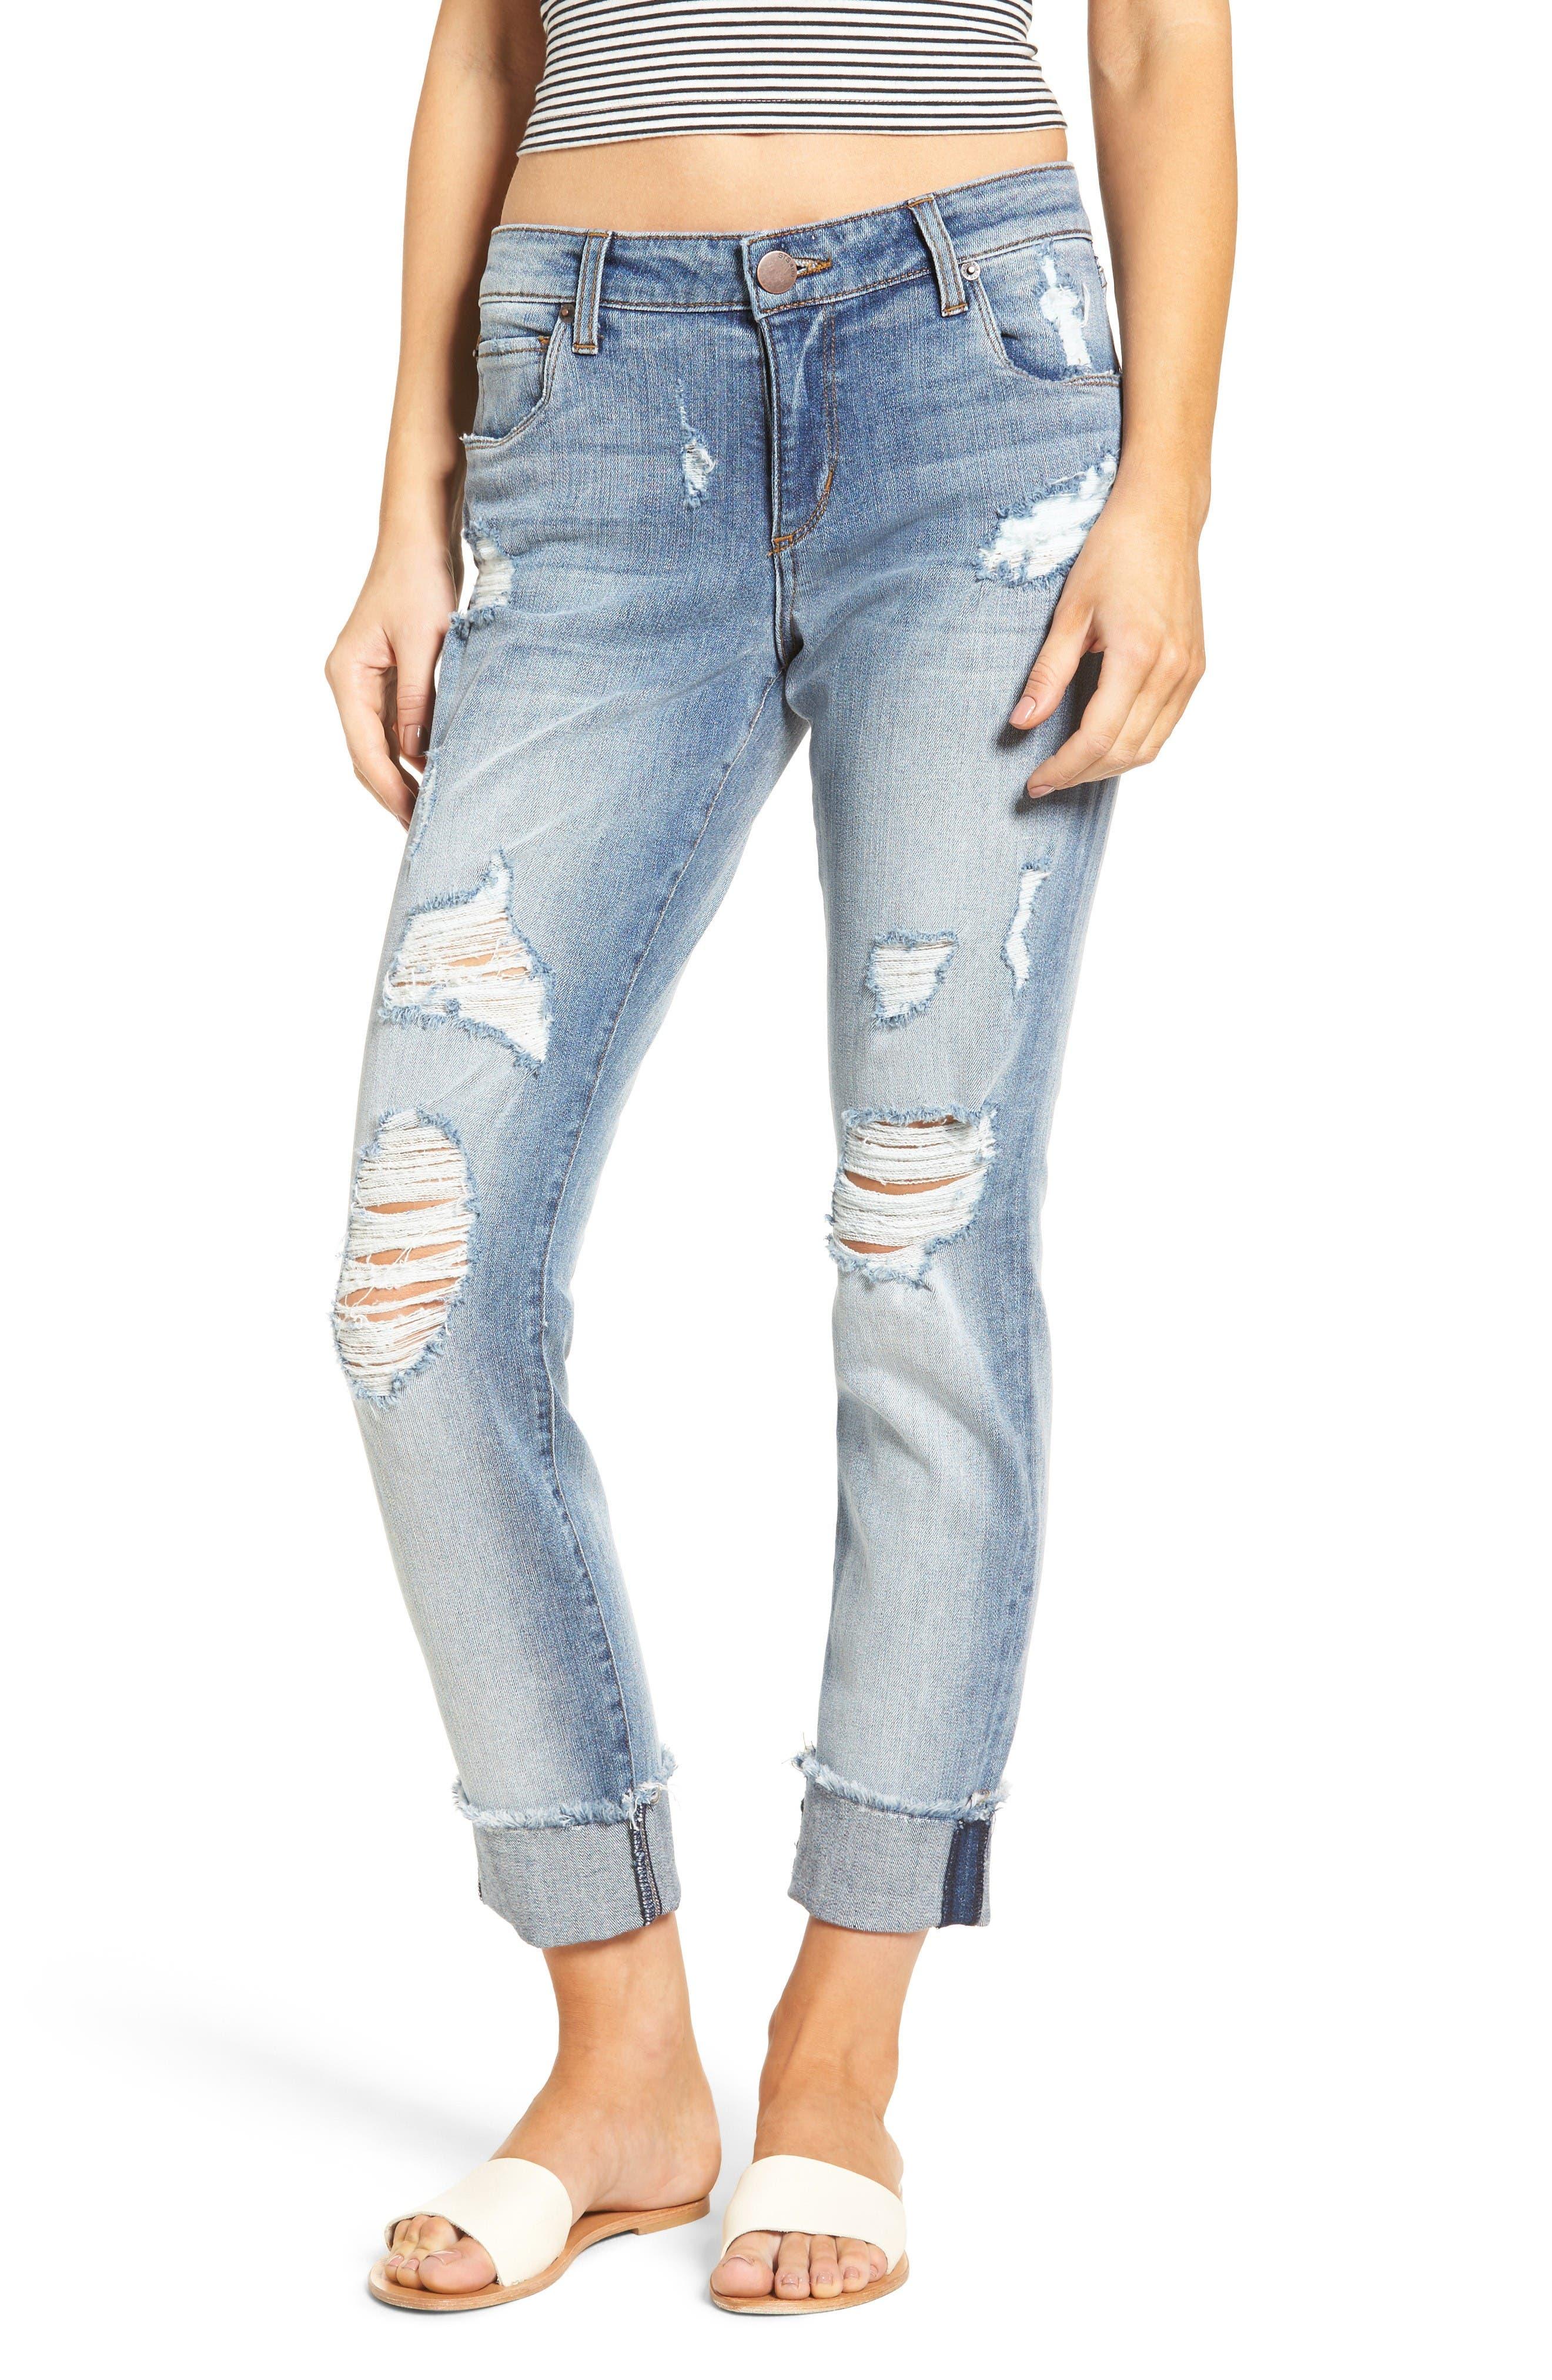 Alternate Image 1 Selected - STS Blue Fray Hem Taylor Tomboy Jeans